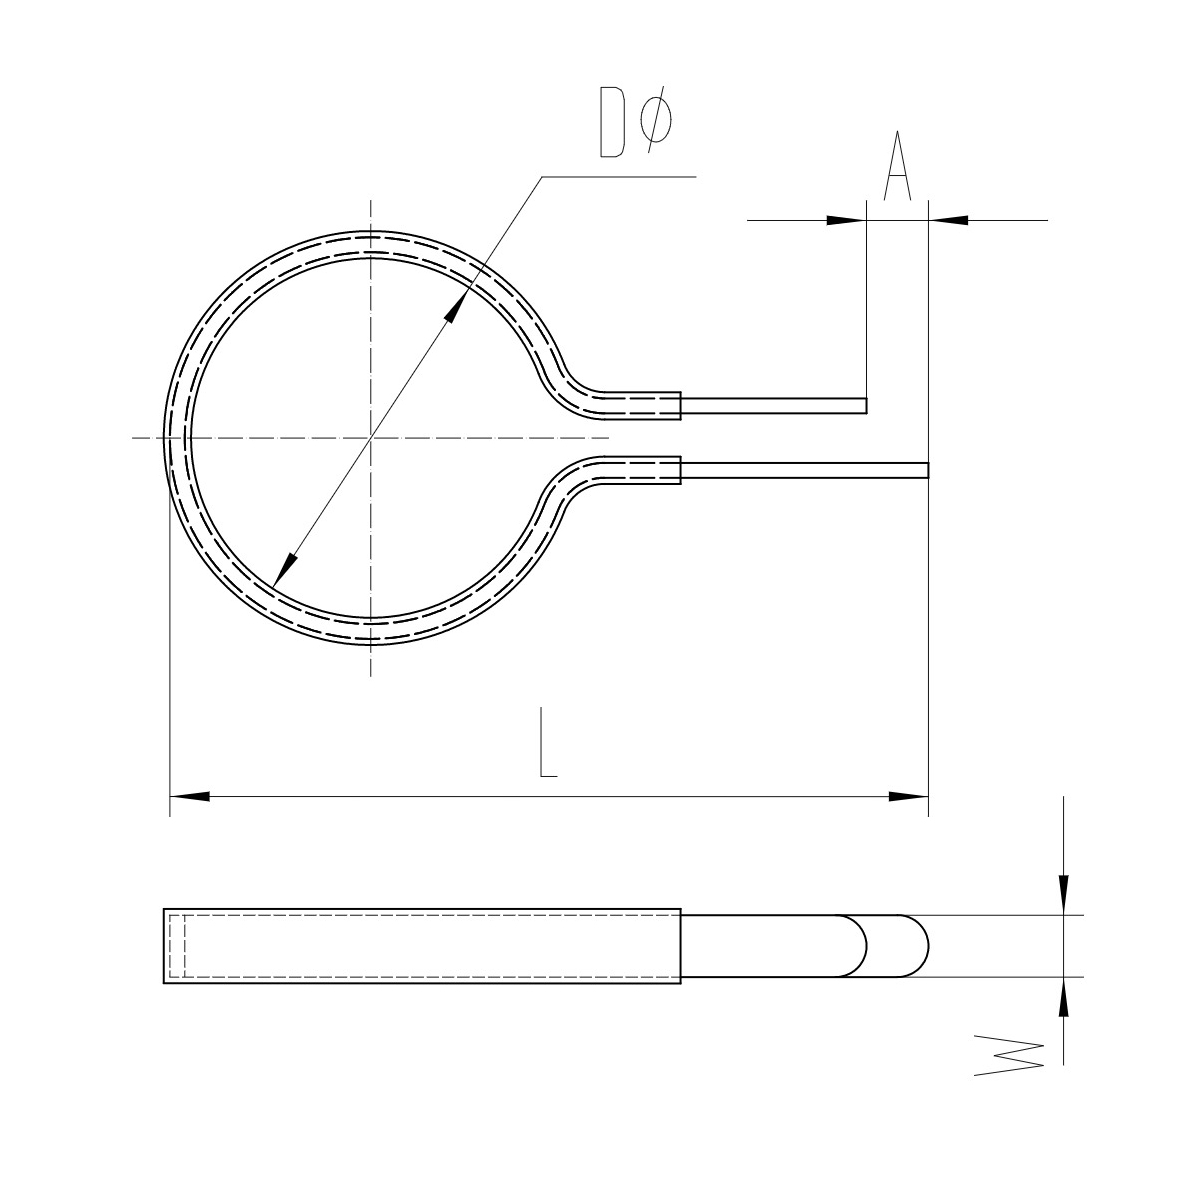 SCR Drawing